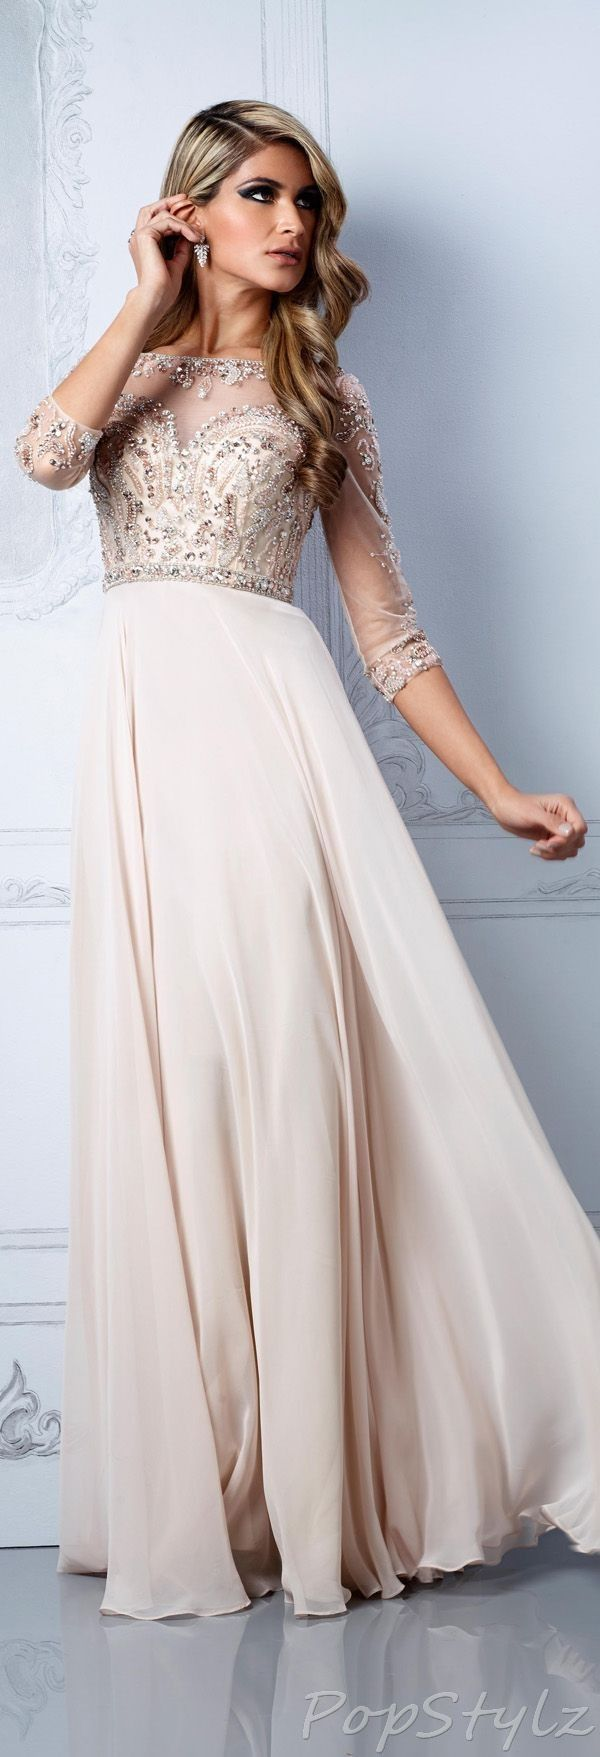 Simple dress matric dresses pinterest simple dresses prom and